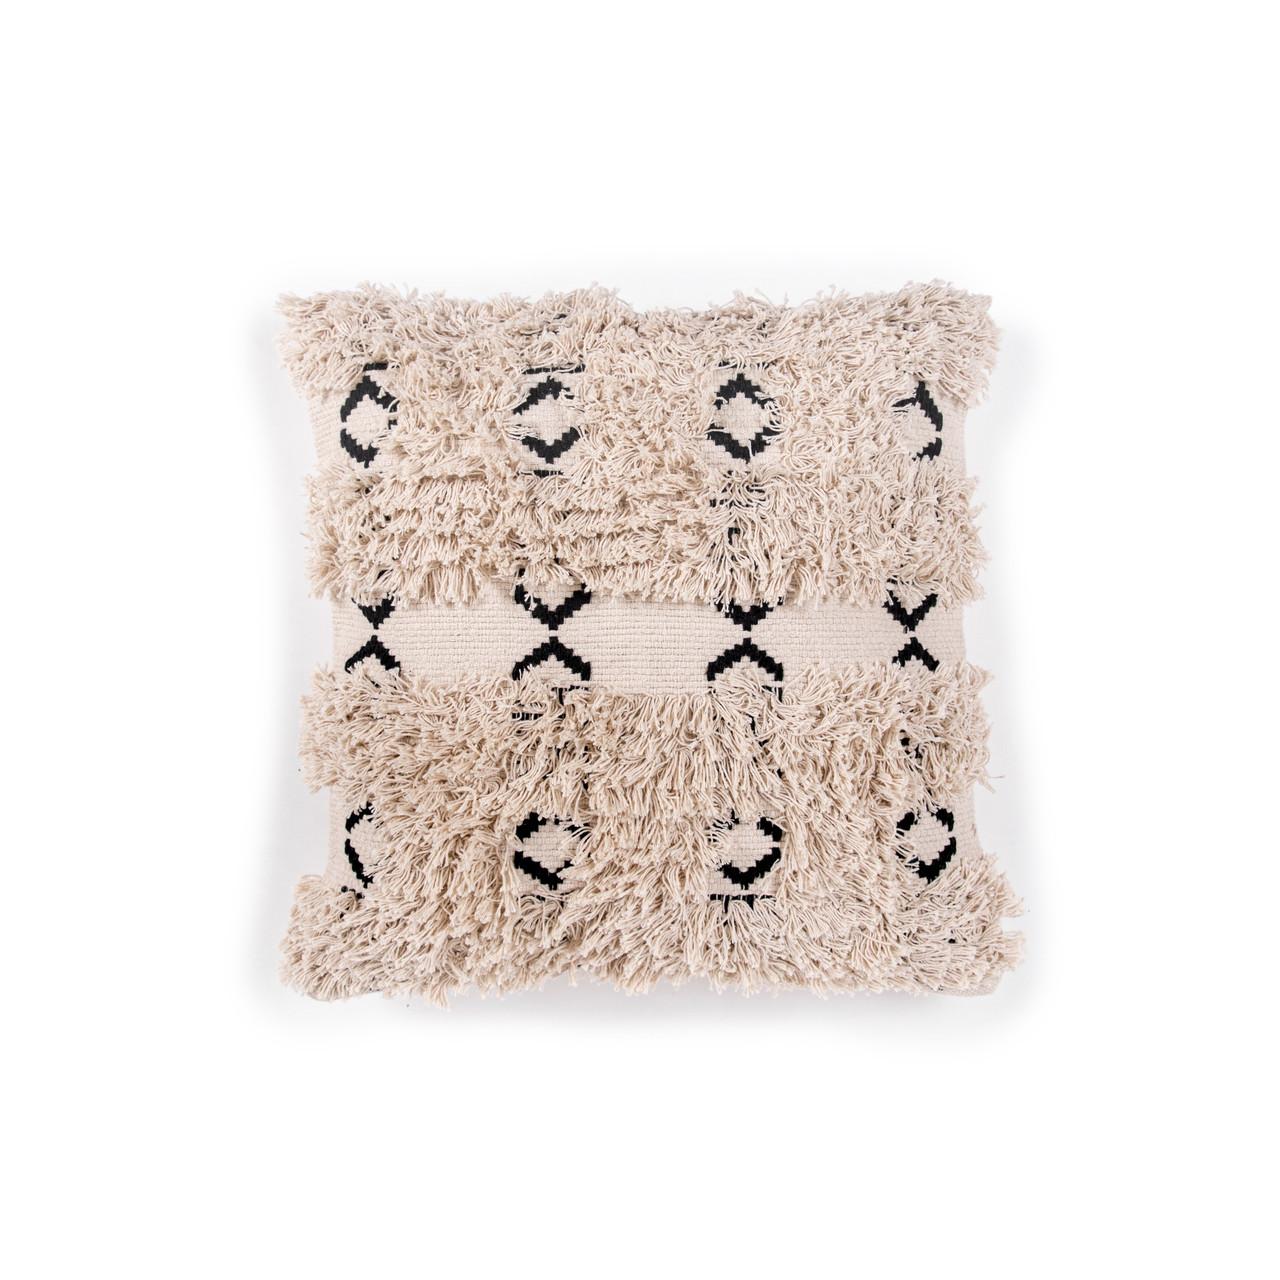 Black and Cream Ikat Fringe Pillow